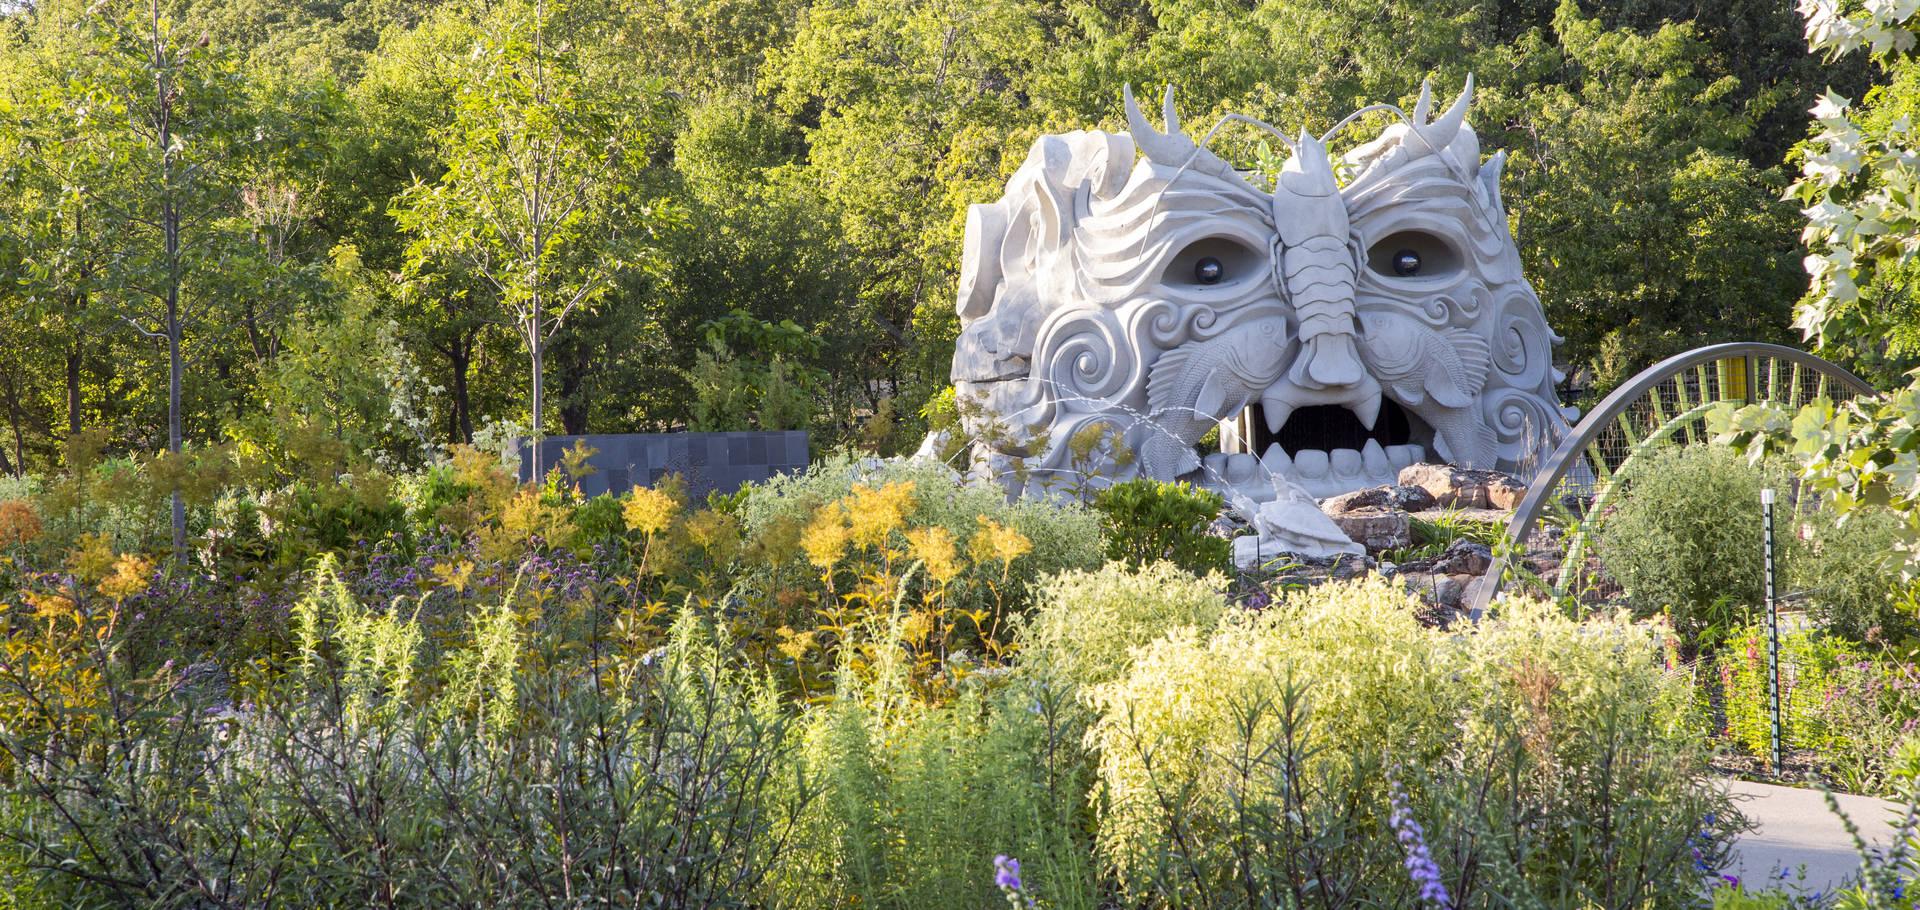 Beau Tulsa Botanic Garden